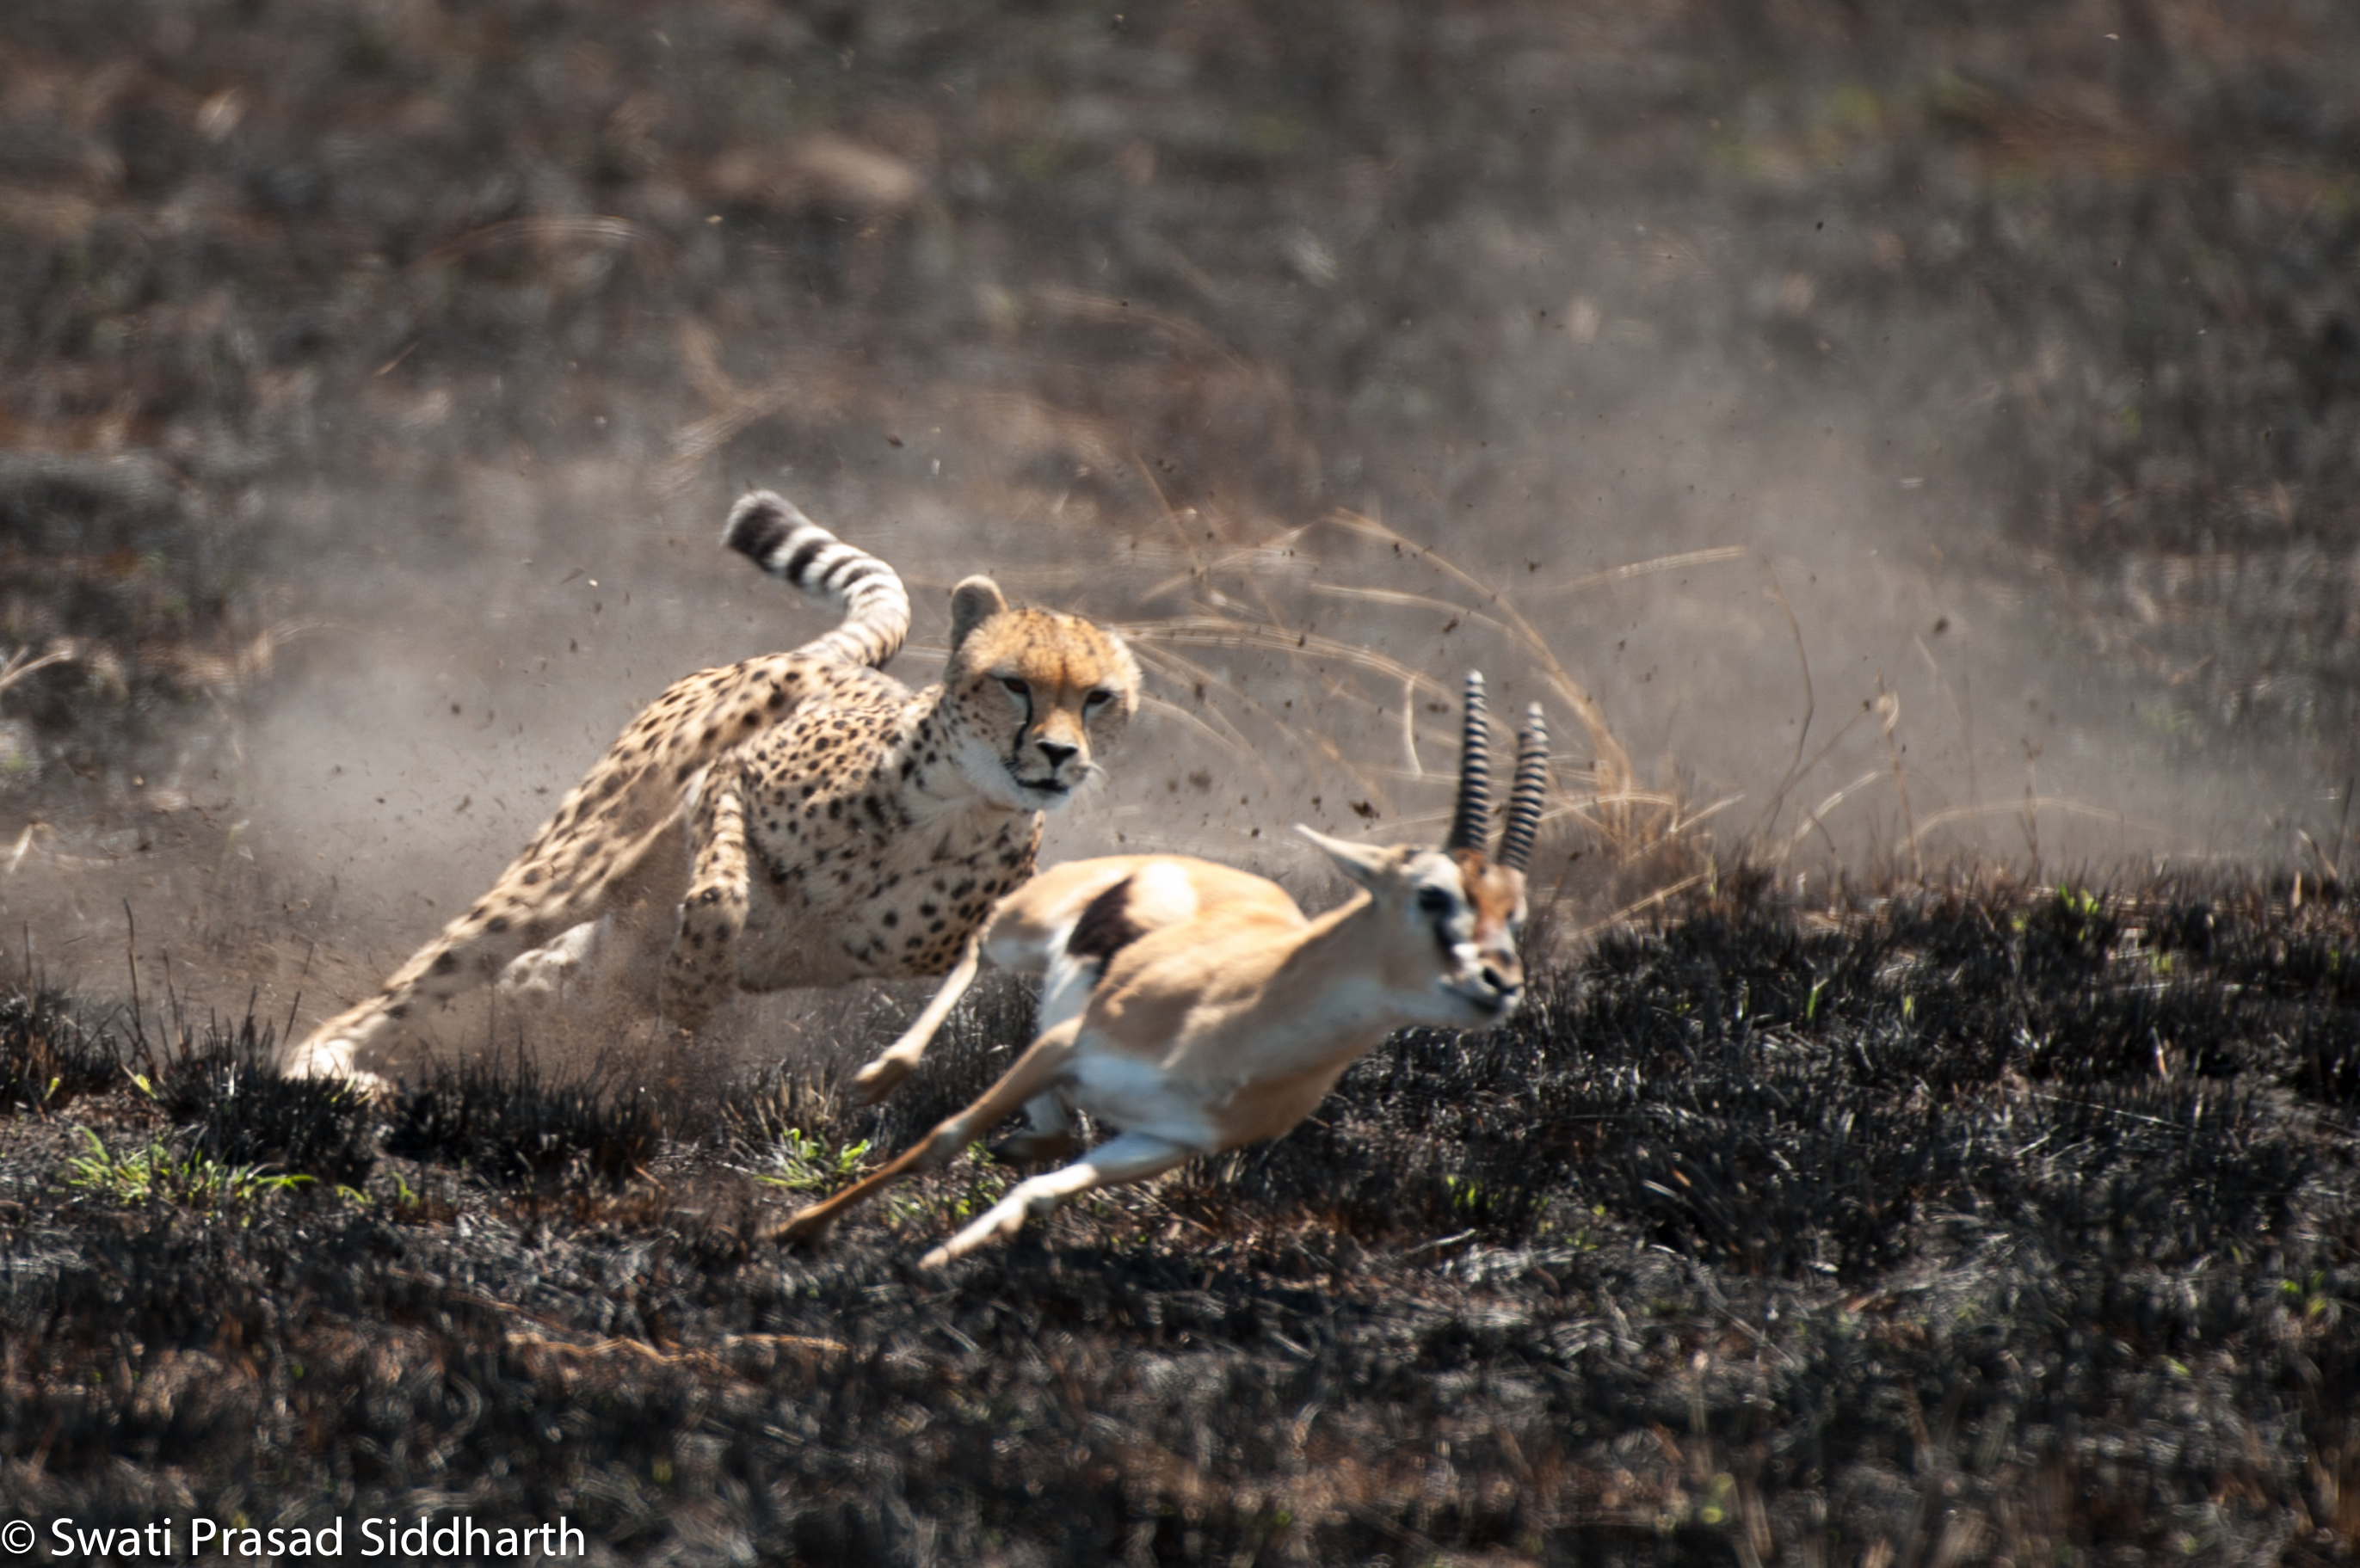 cheetah chasing gazelle gif